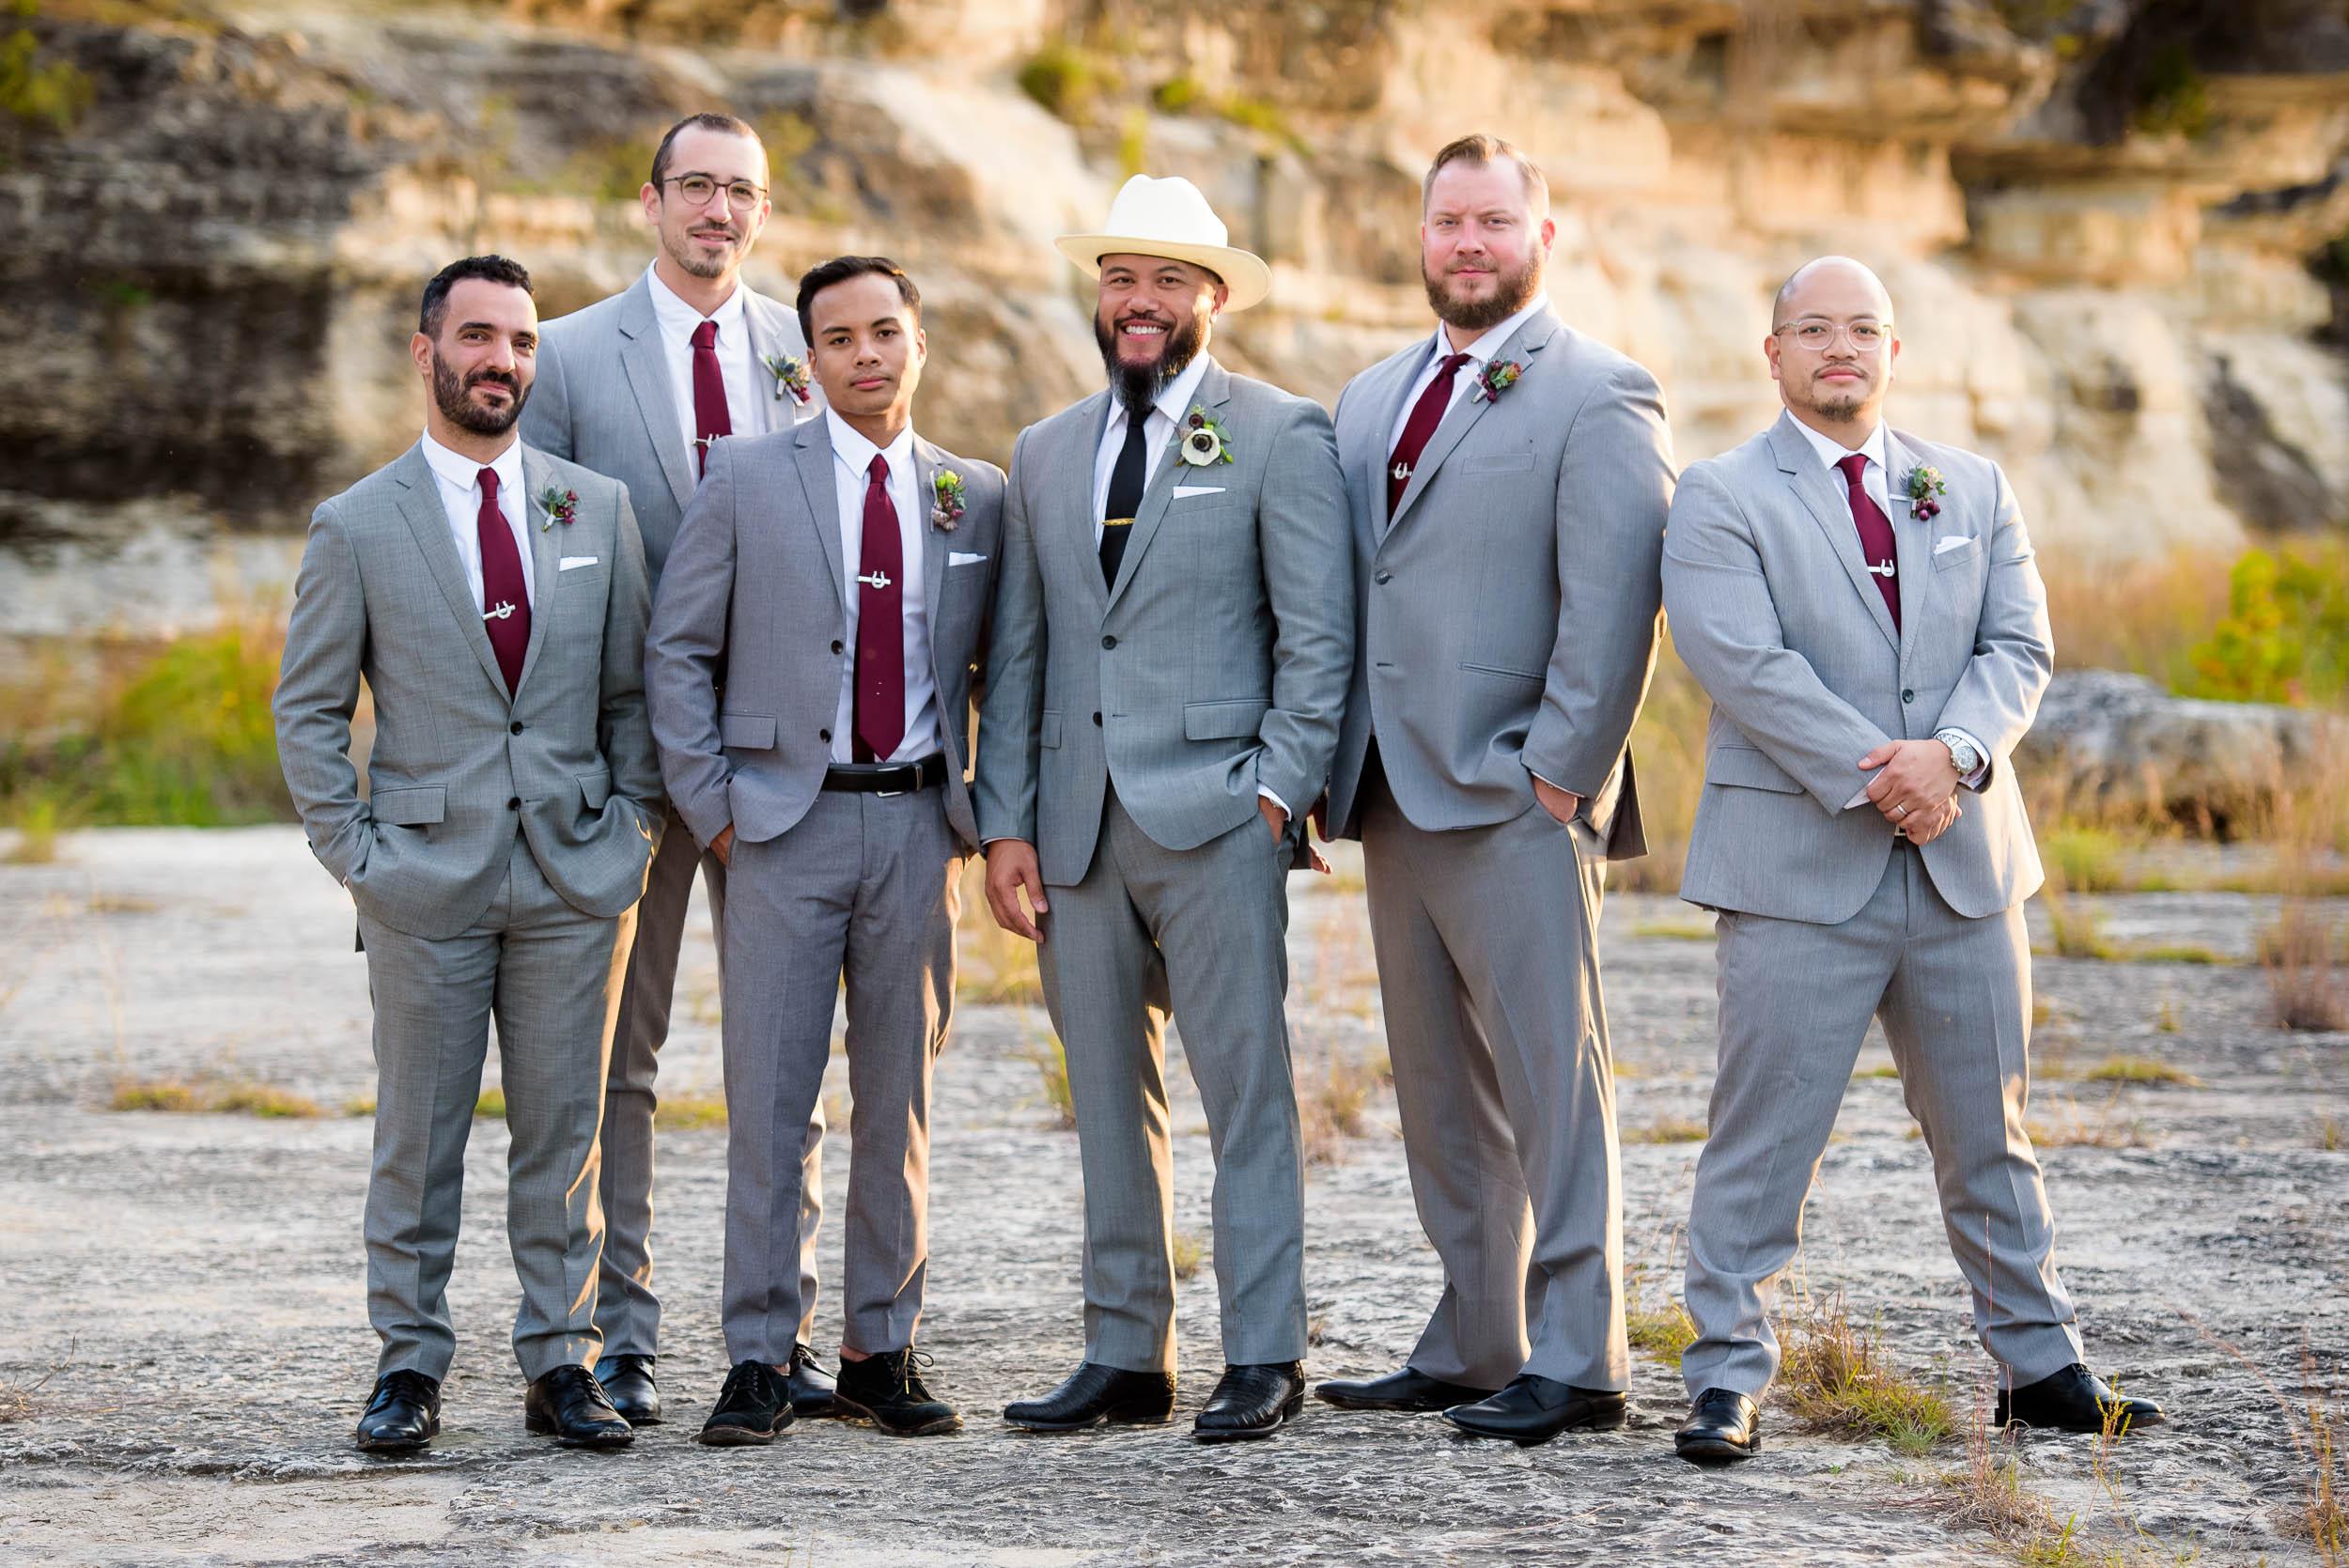 Stylish wedding party during a Montesino Ranch wedding Austin, Texas.